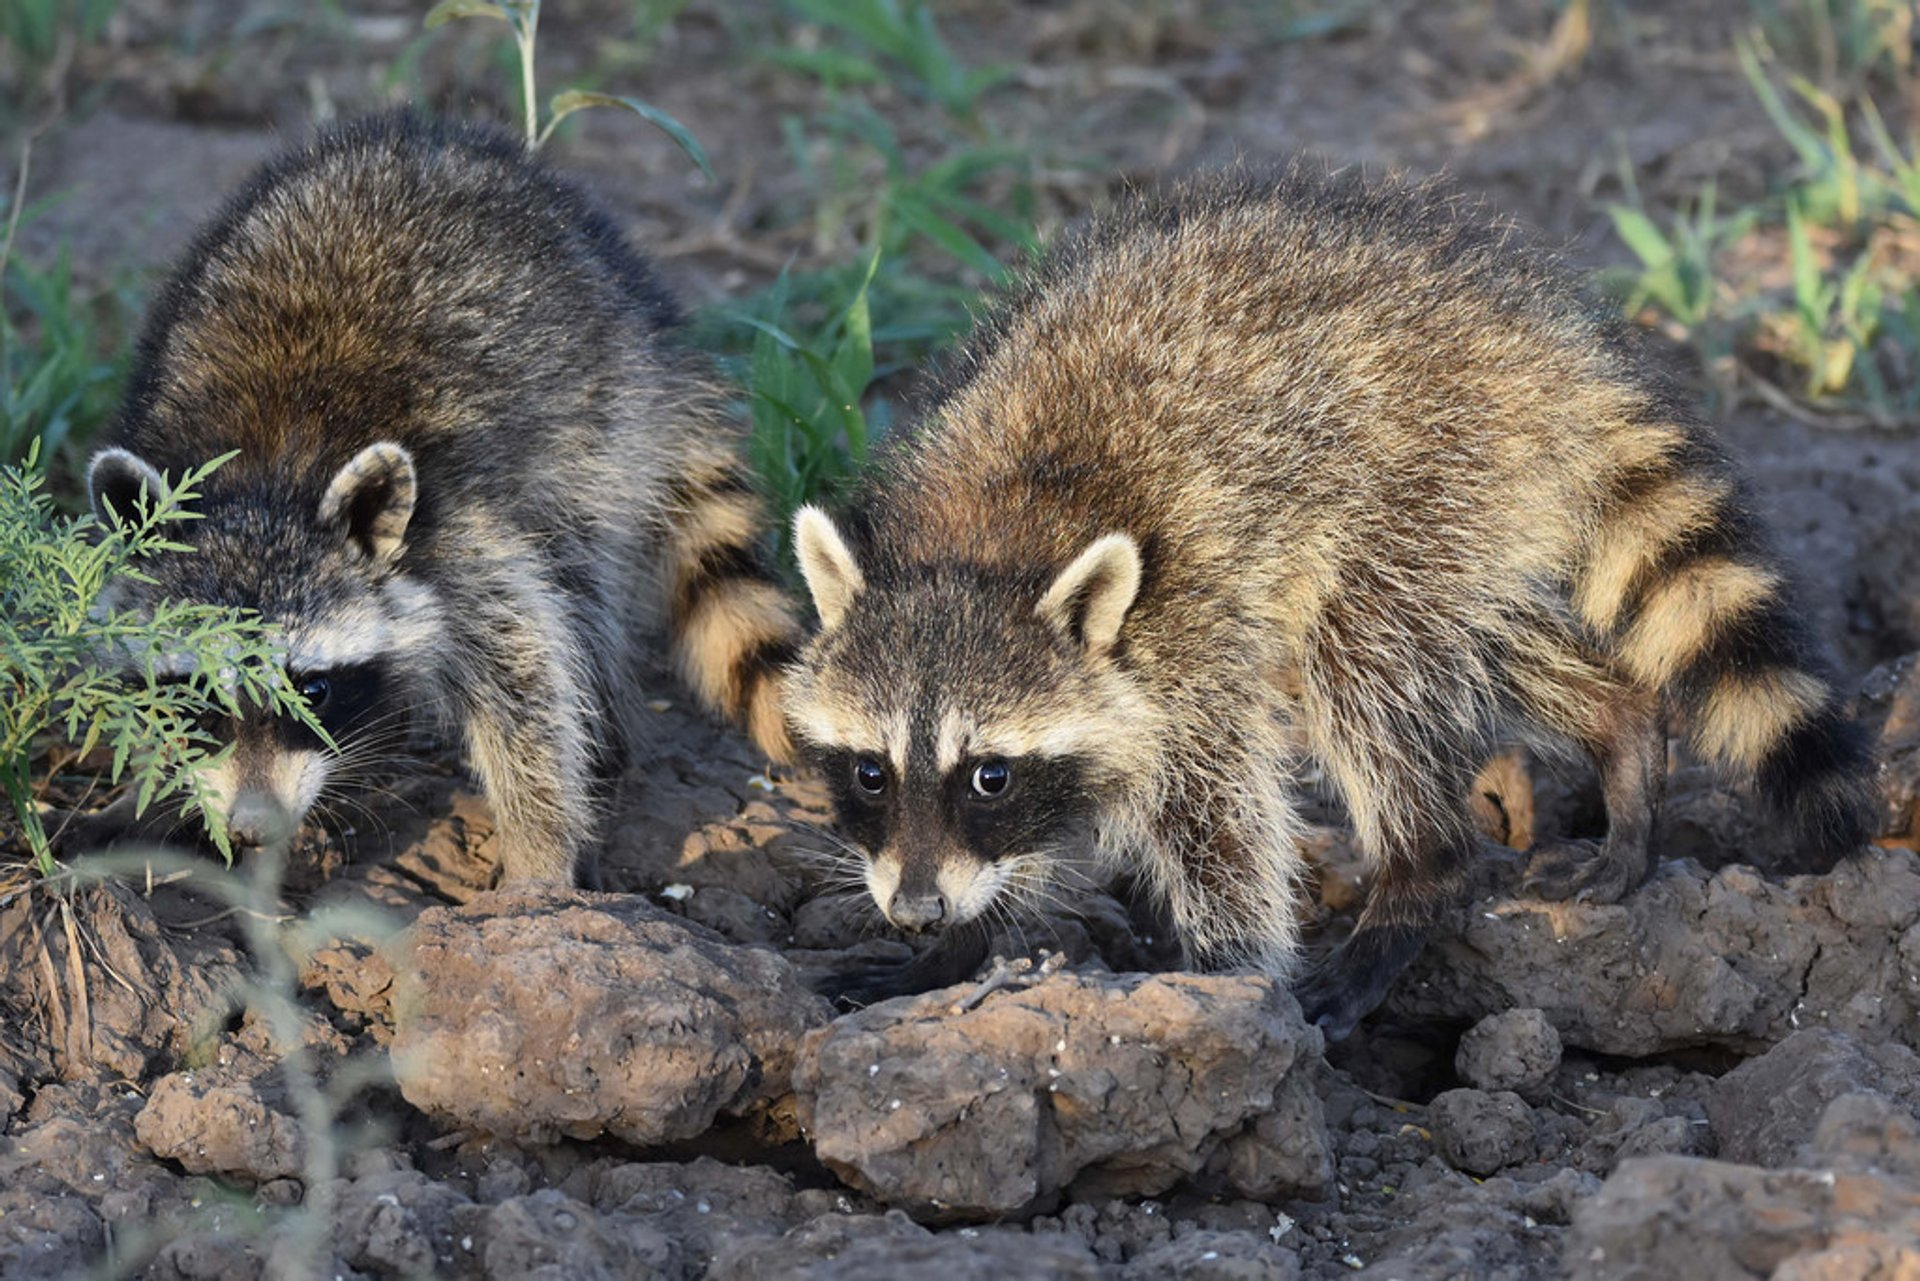 Raccoon in Texas 2019 - Best Time